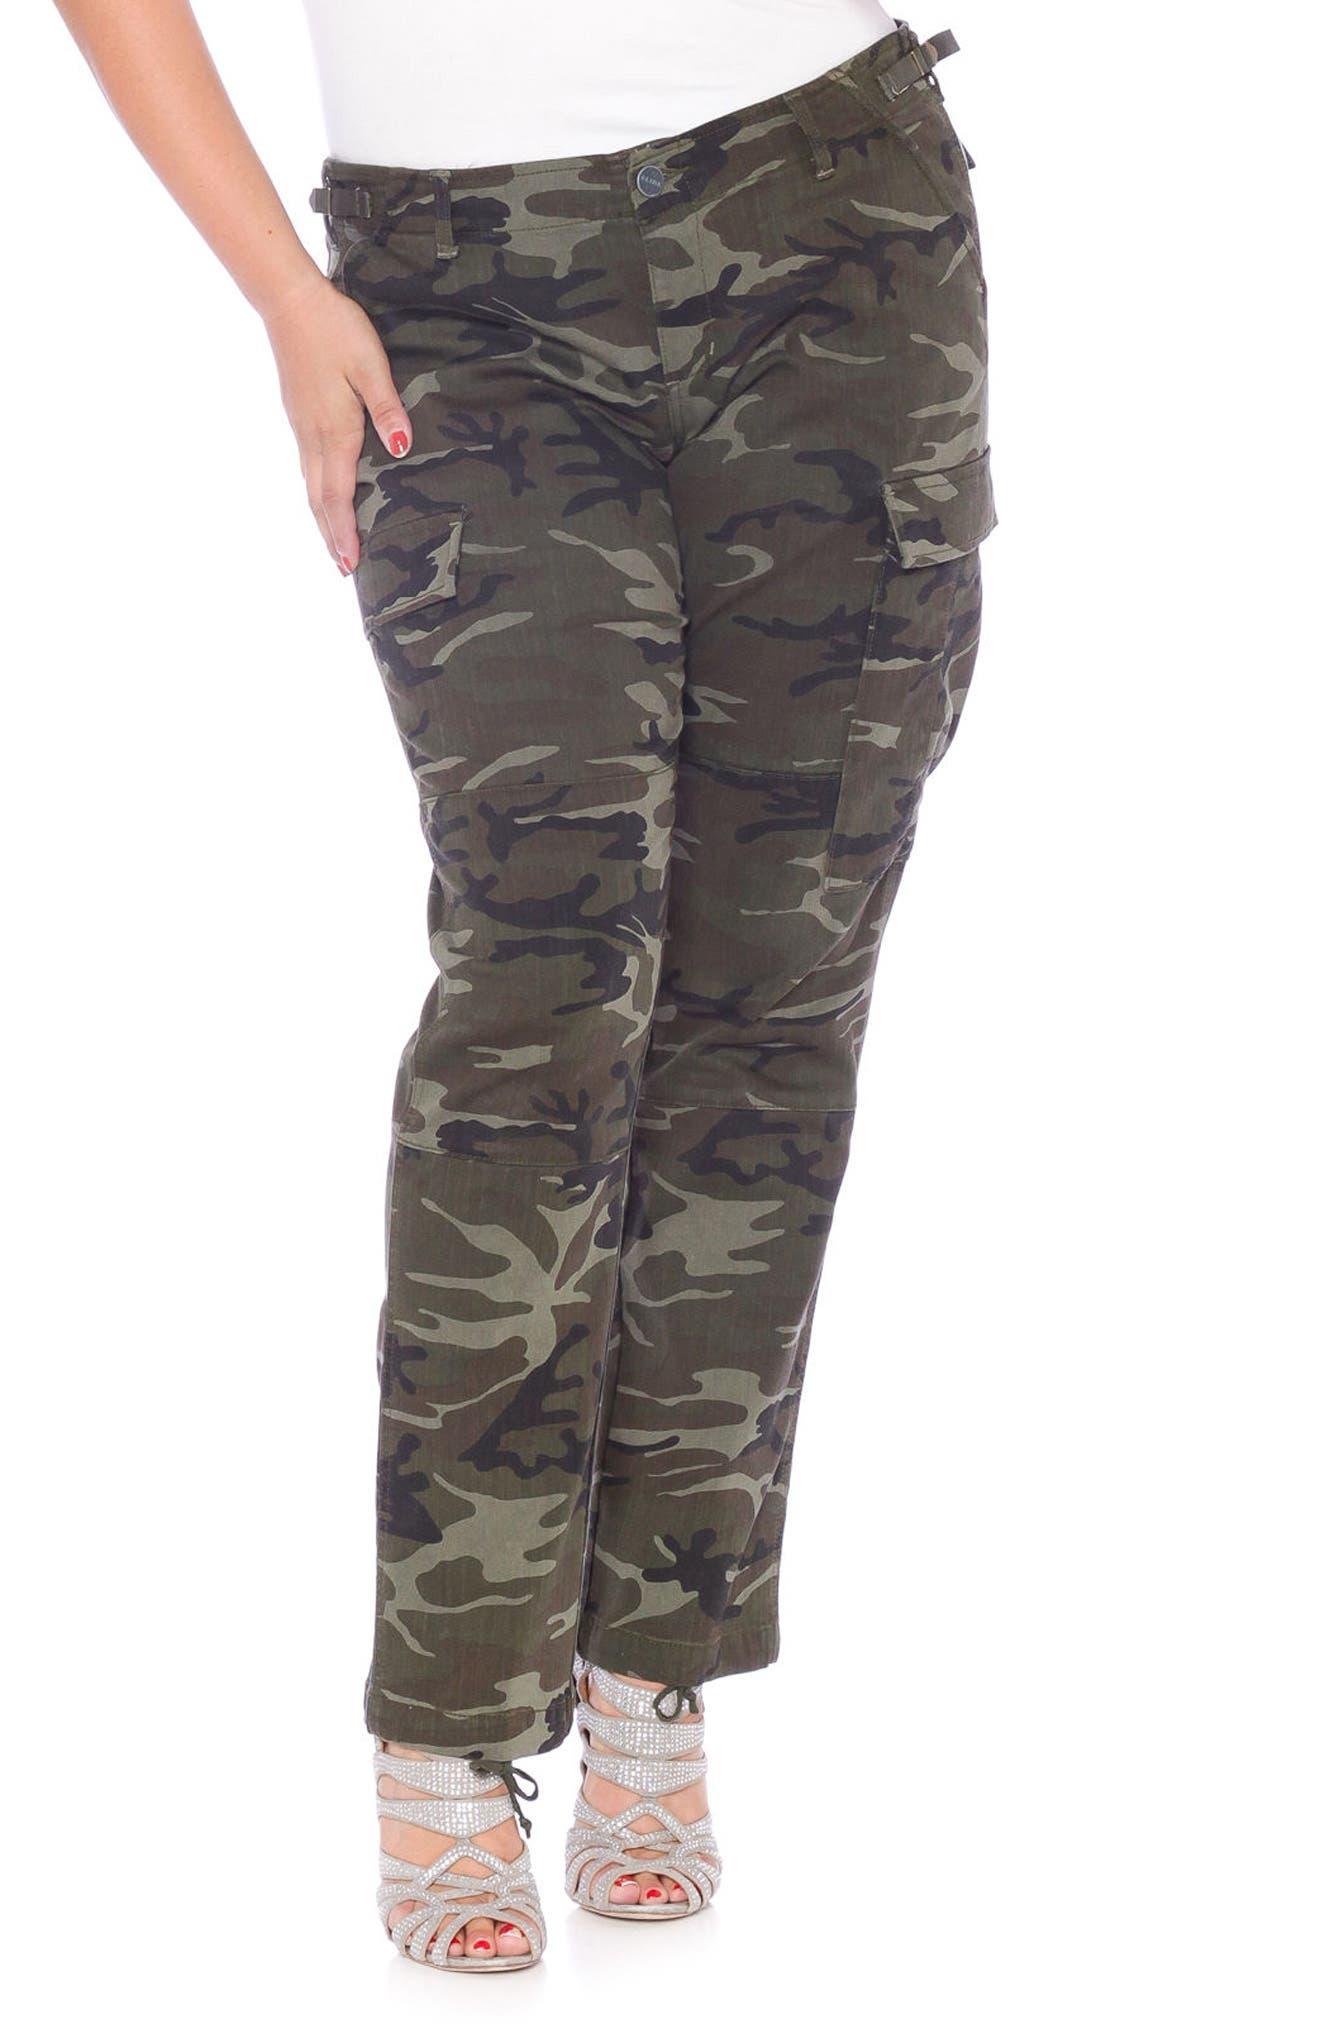 Camo Twill Cargo Pants,                         Main,                         color, Olive Camo